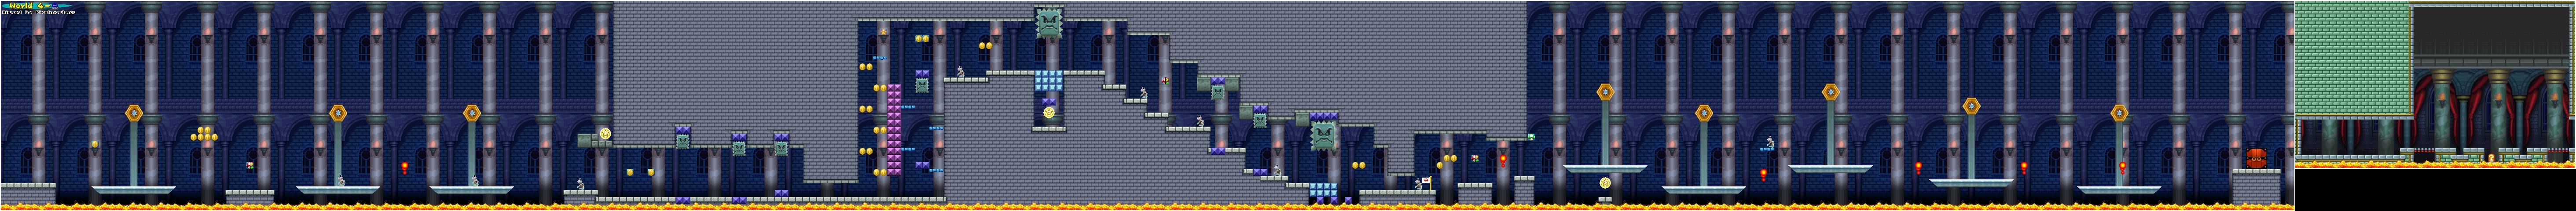 NewSuperMarioBros-World4-Castle.png